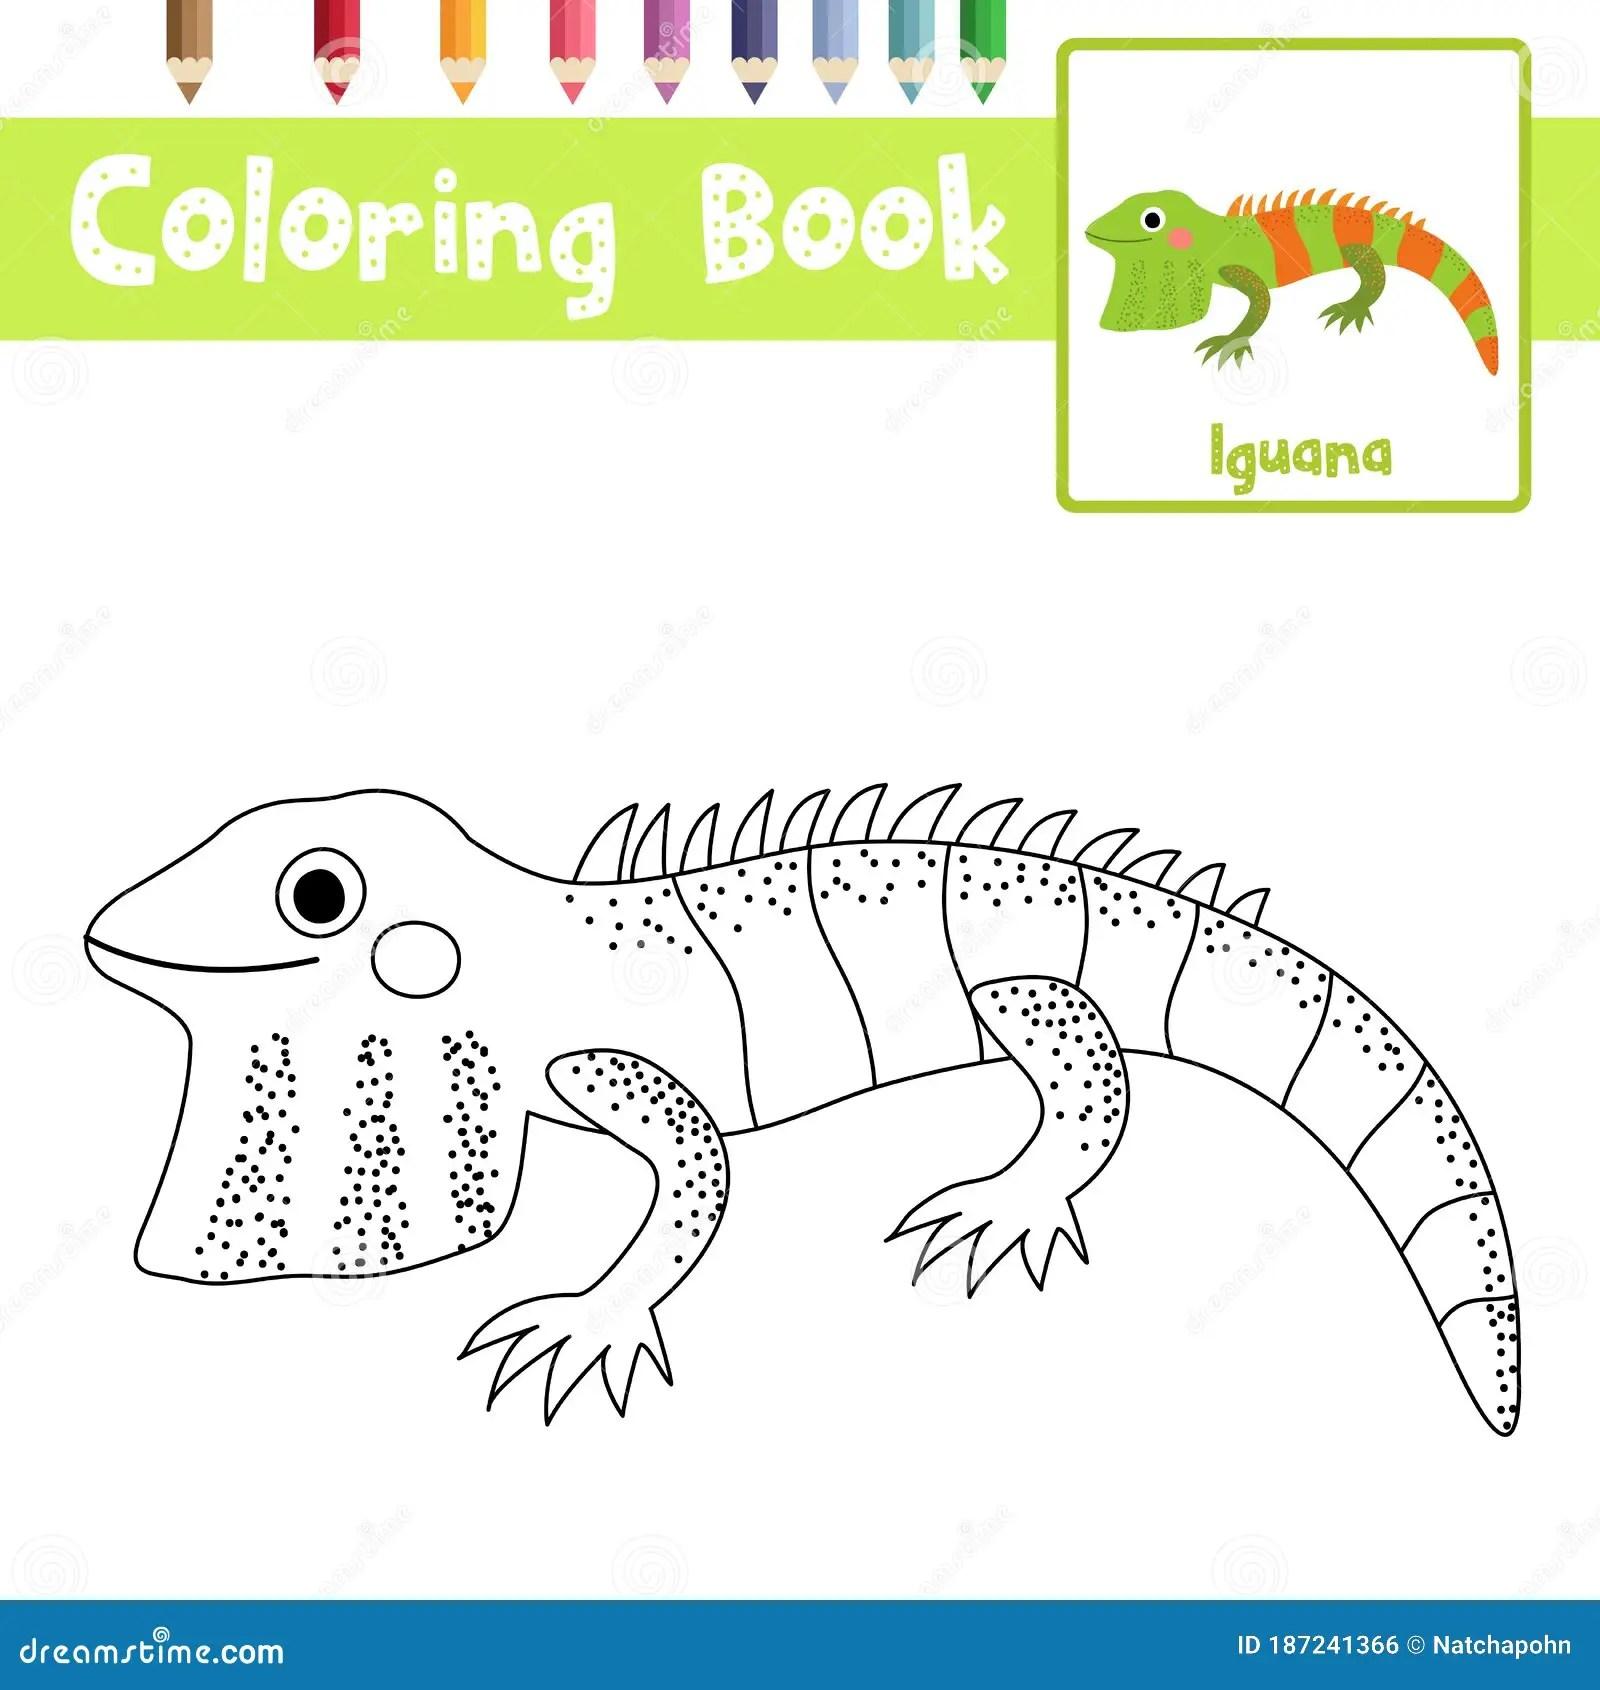 Coloring Page Iguana Animal Cartoon Character Vector